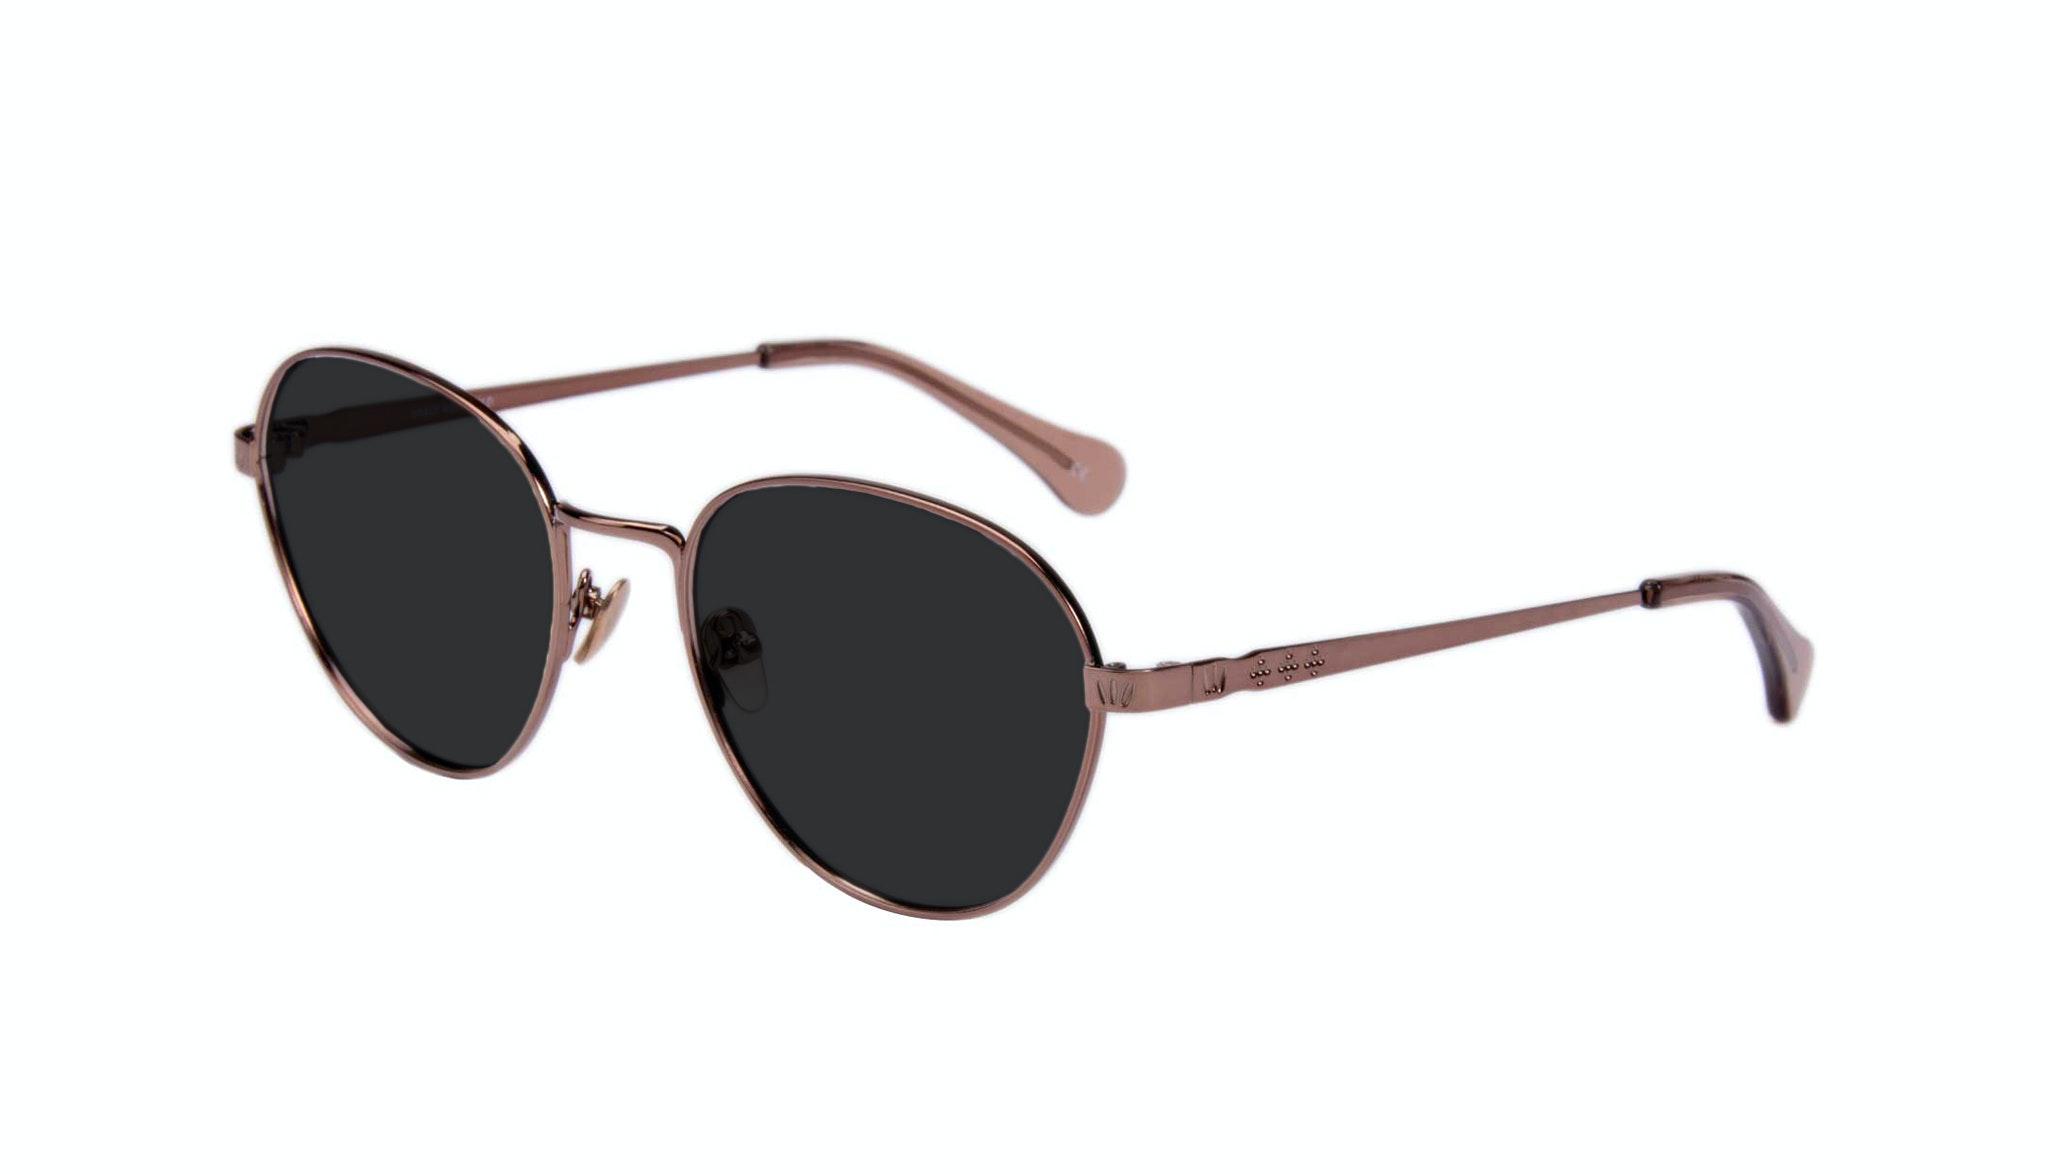 Affordable Fashion Glasses Round Sunglasses Women Brace Rose Gold Tilt